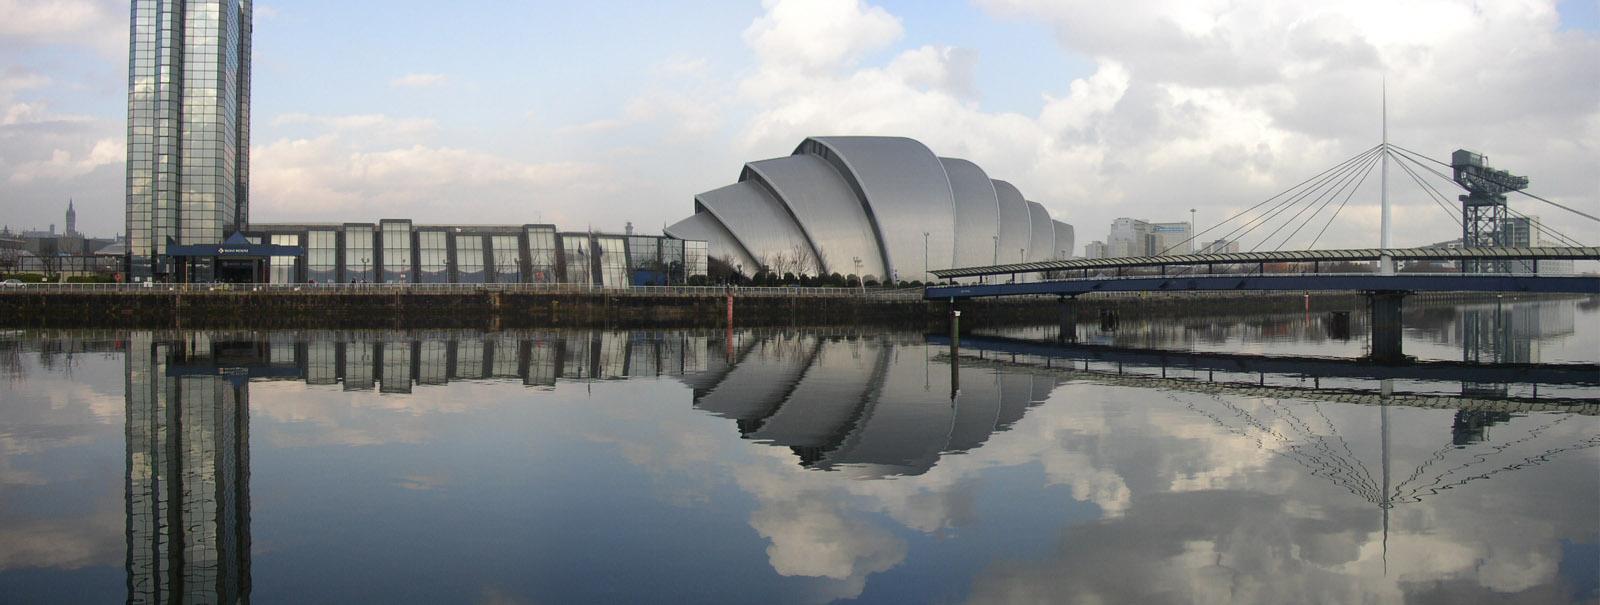 Imagenes de edificios modernos!! increibles!!!